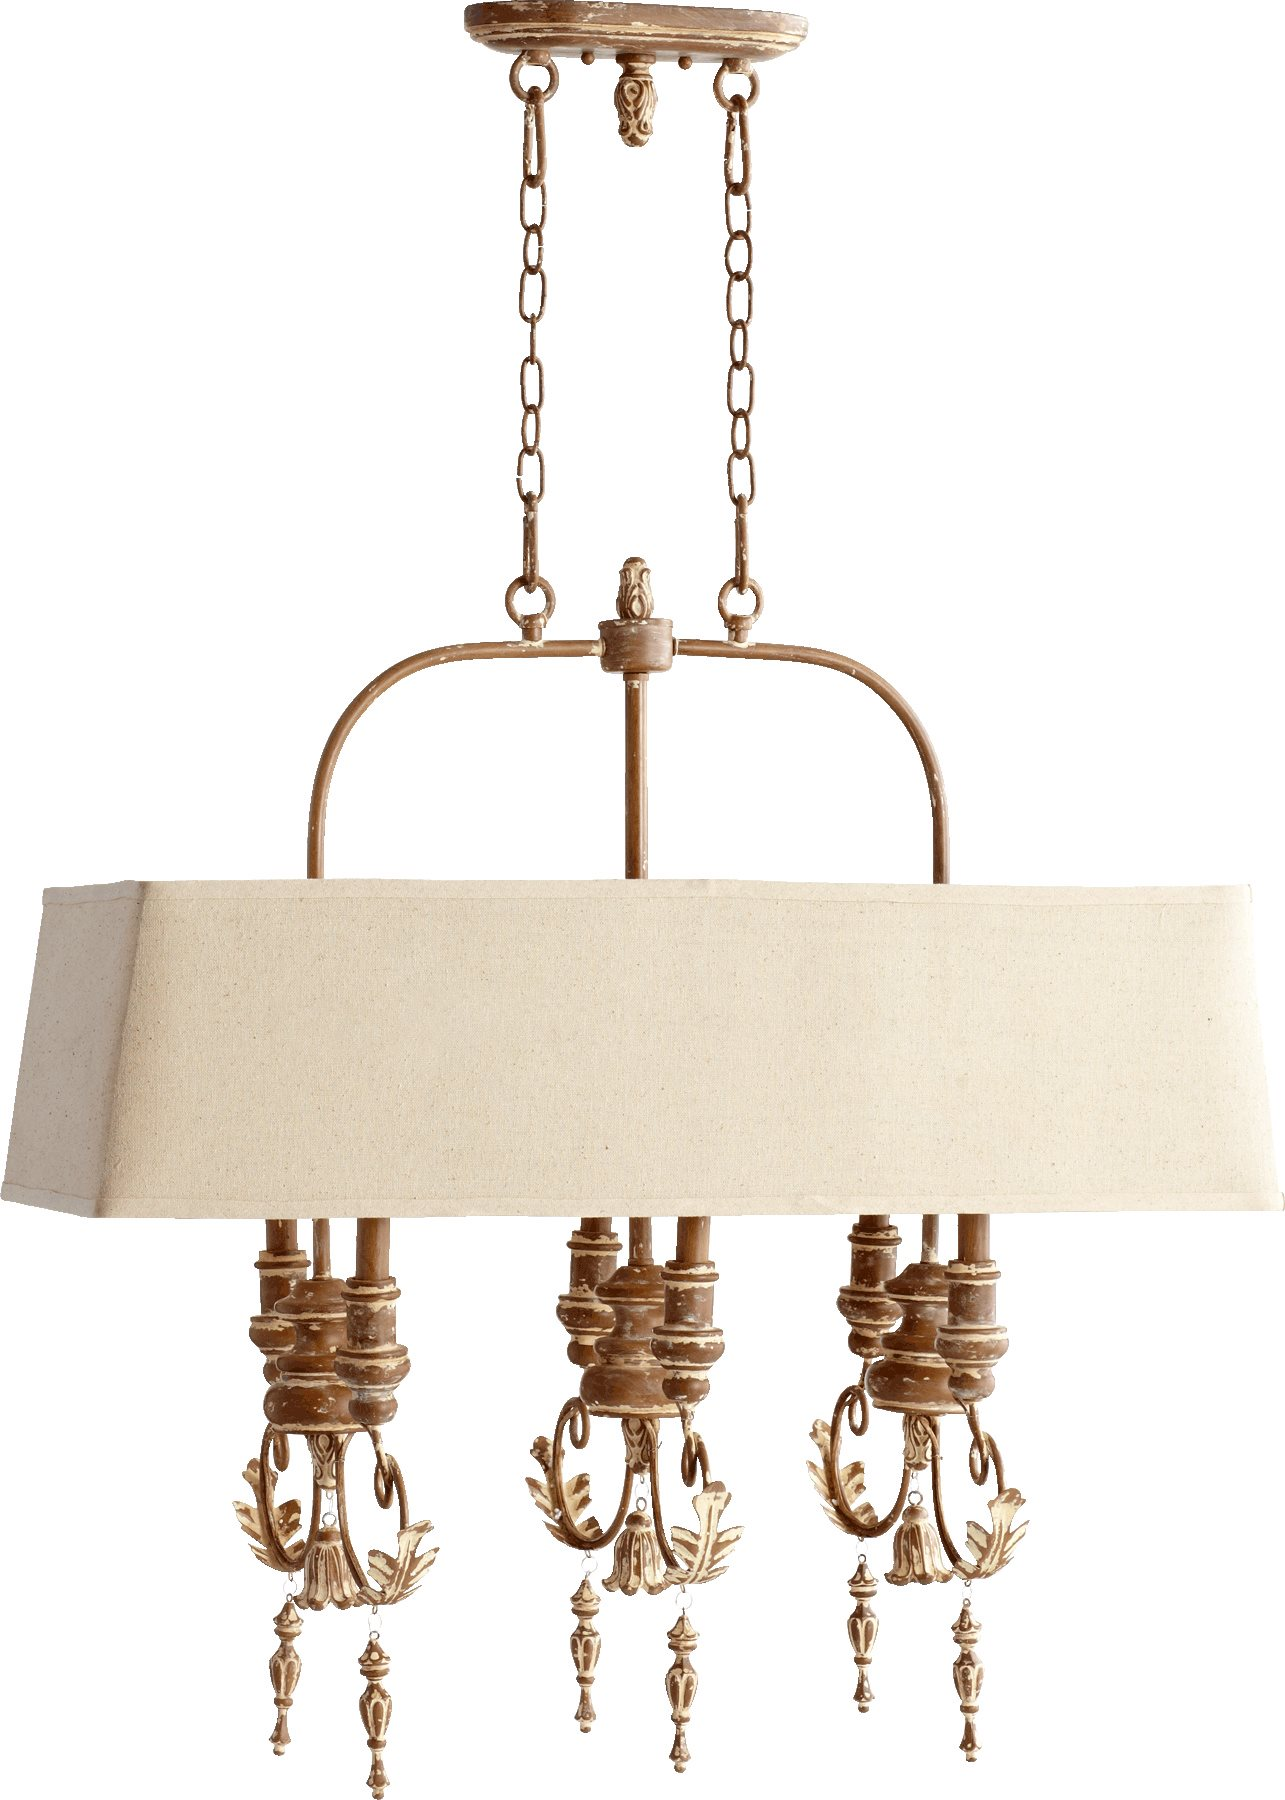 Quorum lighting 6506 6 94 salento traditional kitchen for Traditional kitchen pendant lights